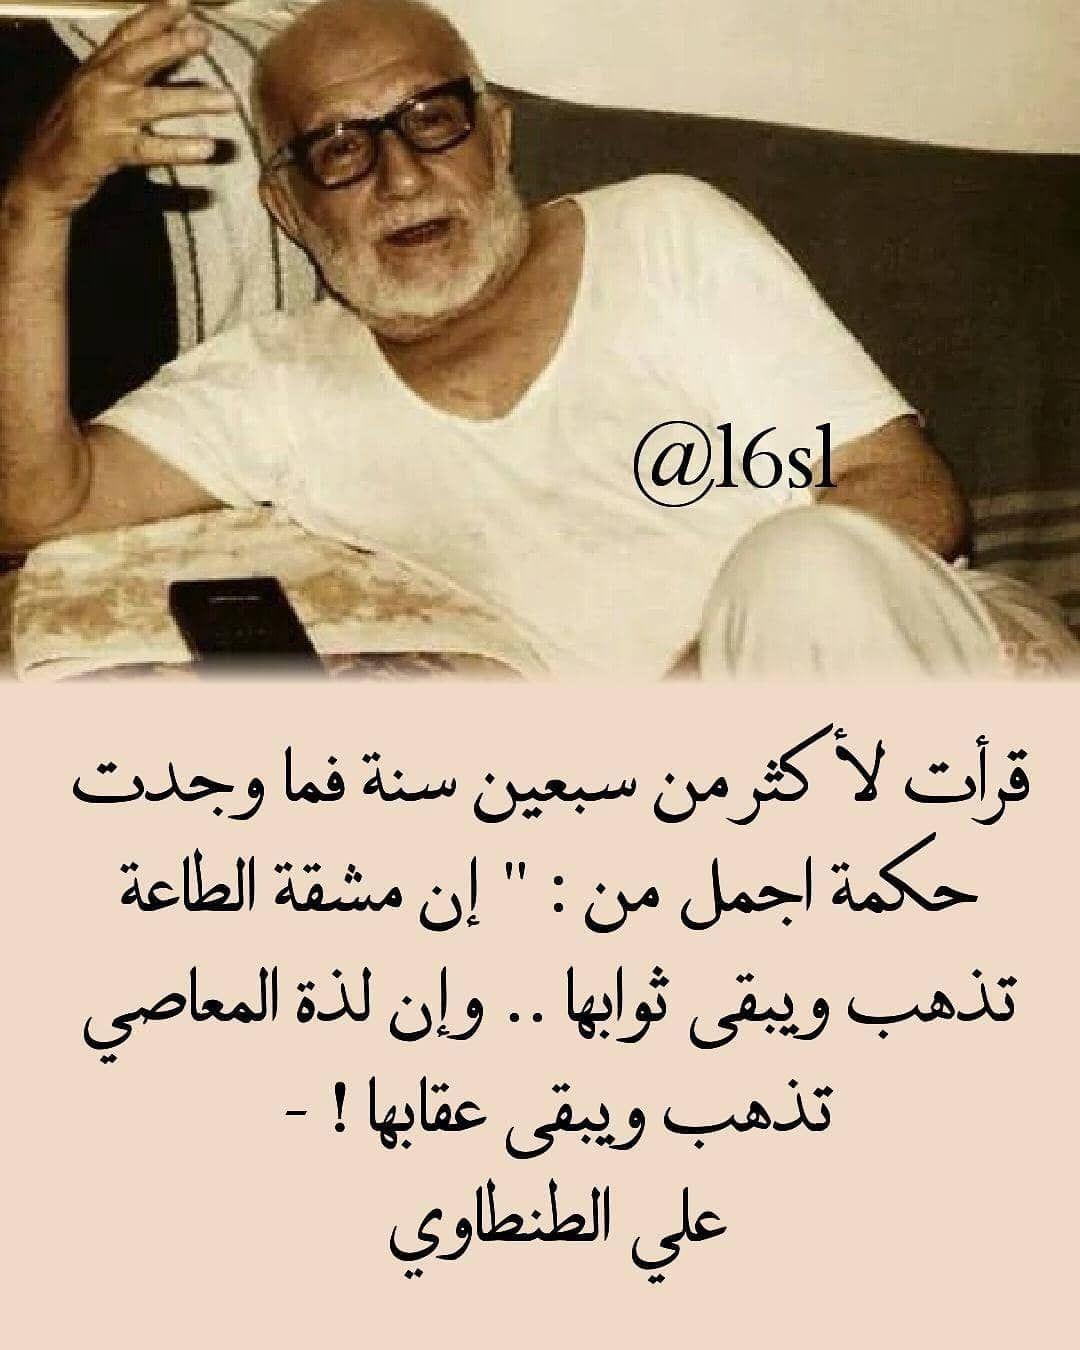 كيف تصبح عبقريا ذو ذكاء خارق حقائق مذهلة Belles Citations Citation Coran